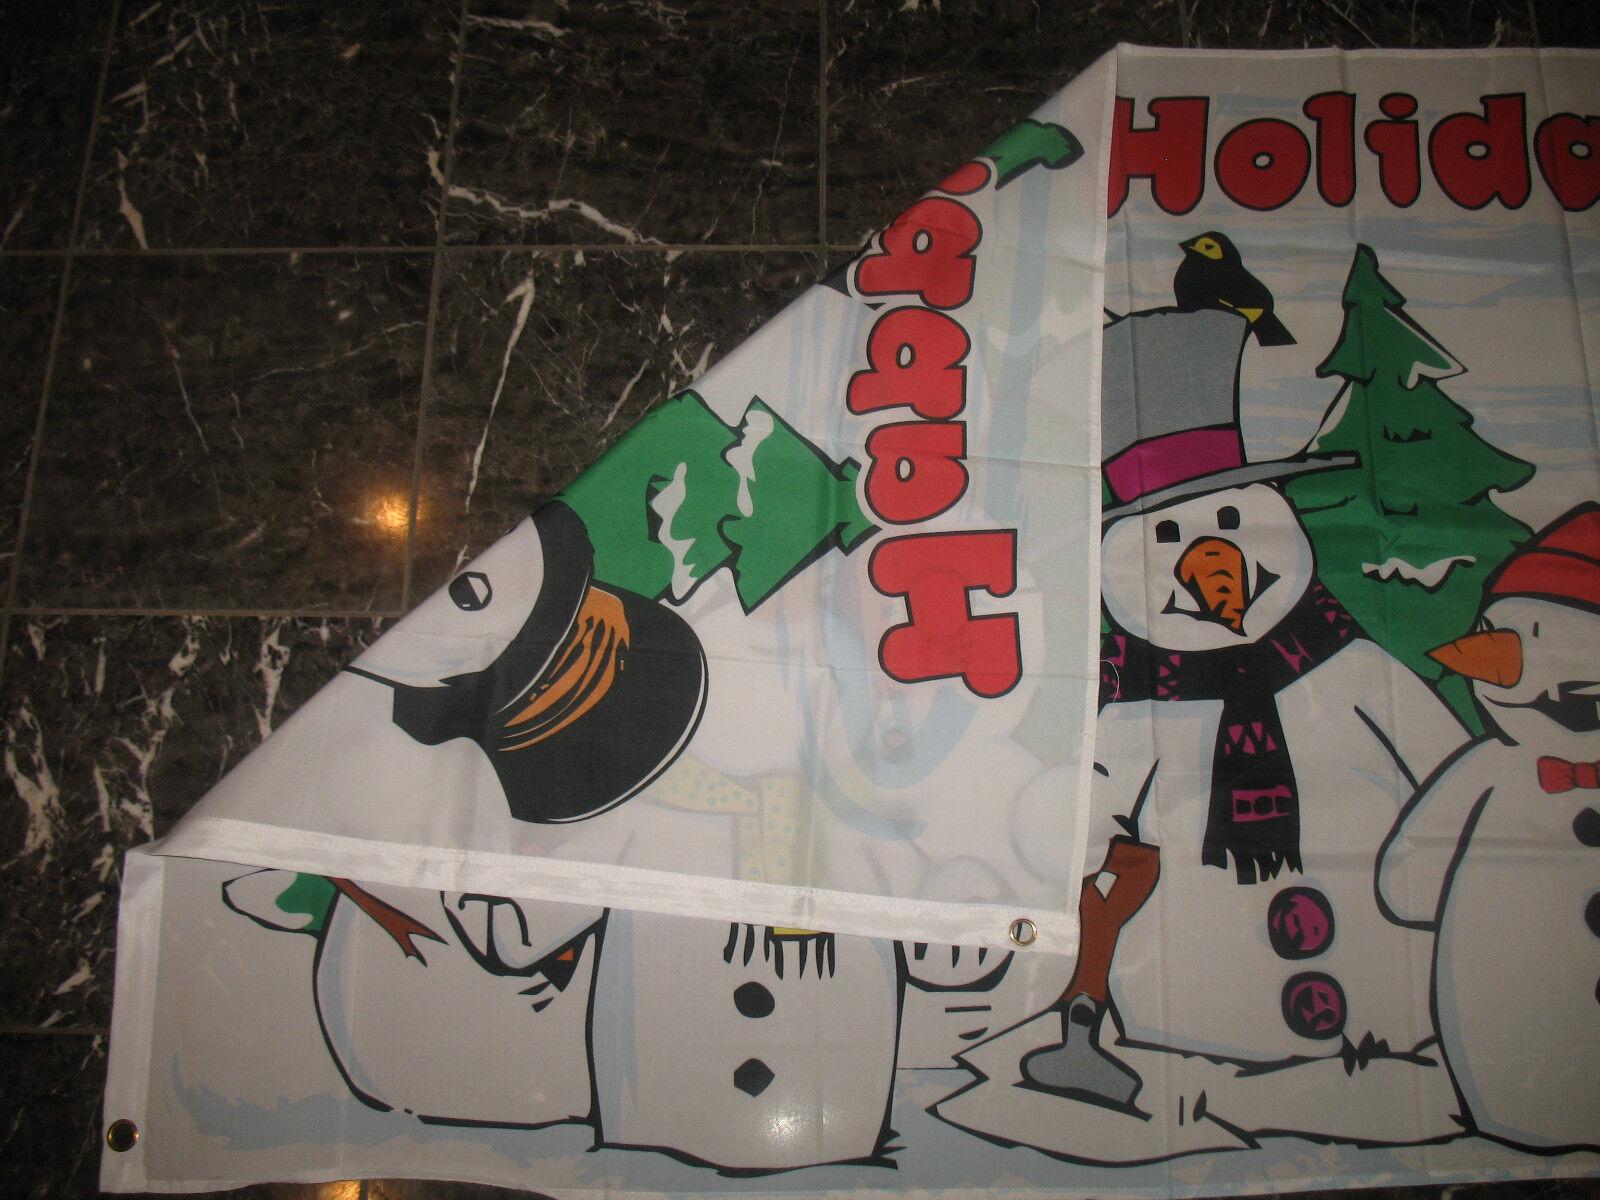 3x5 HAPPY HOLIDAYS Snowmen FLAG 3X5 FEET 3/'X5/' SNOWMAN WINTER  SNOW 3/'x5/' banner